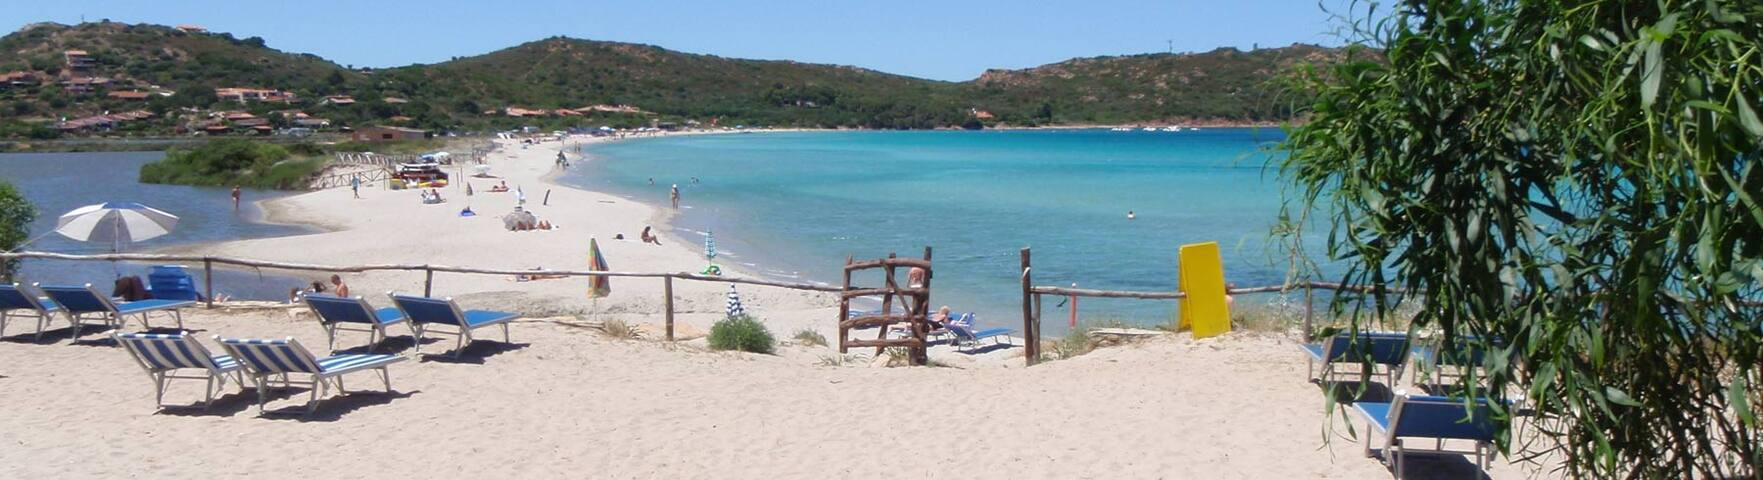 Sardegna - Casa vacanze  sul mare - Porto Taverna - Porto Taverna